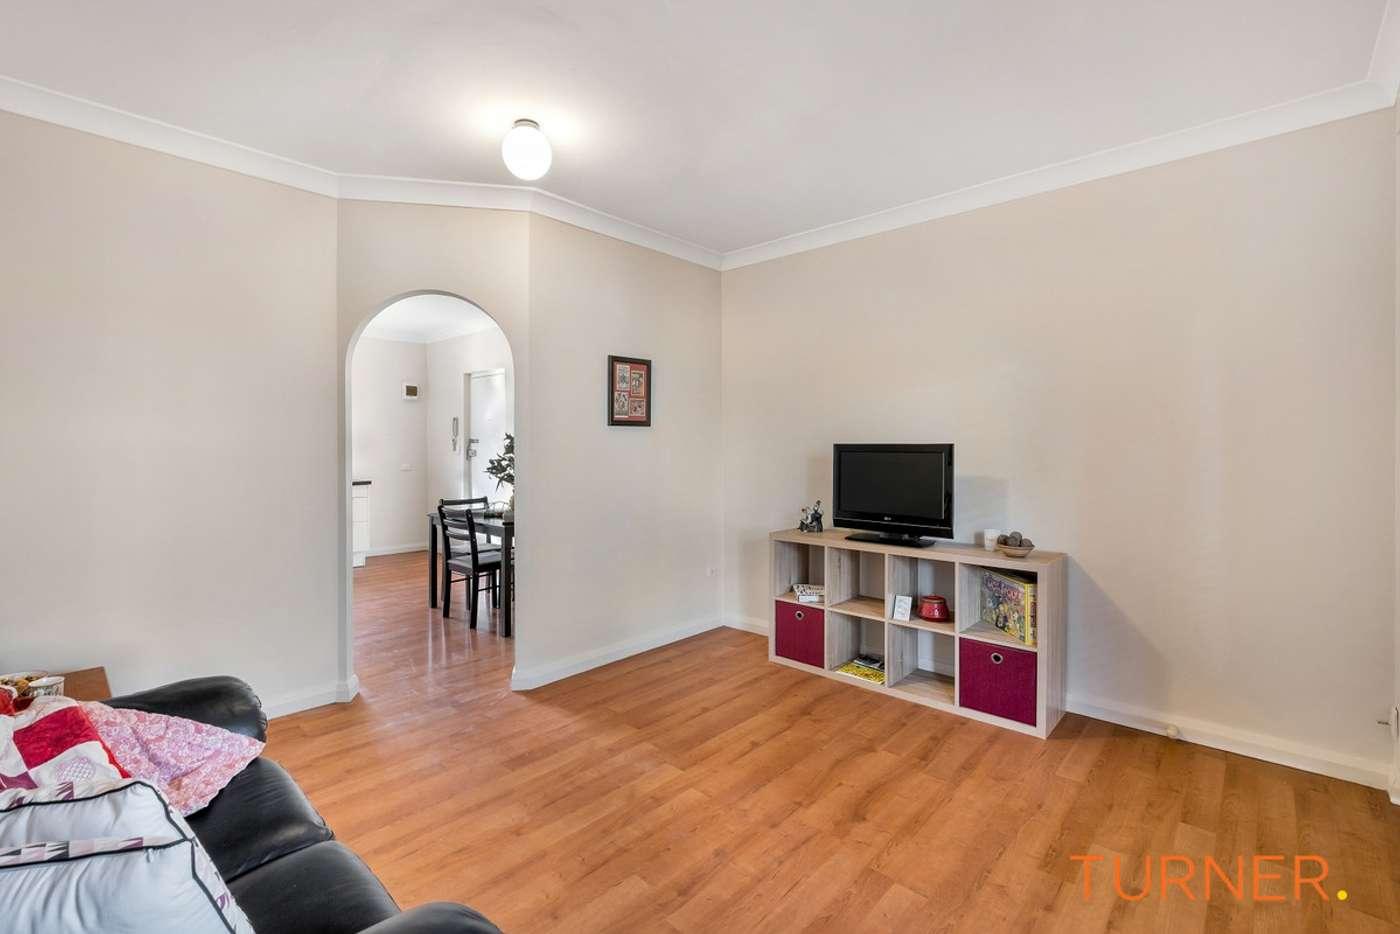 Sixth view of Homely unit listing, 8/22-24 Charles Street, Norwood SA 5067